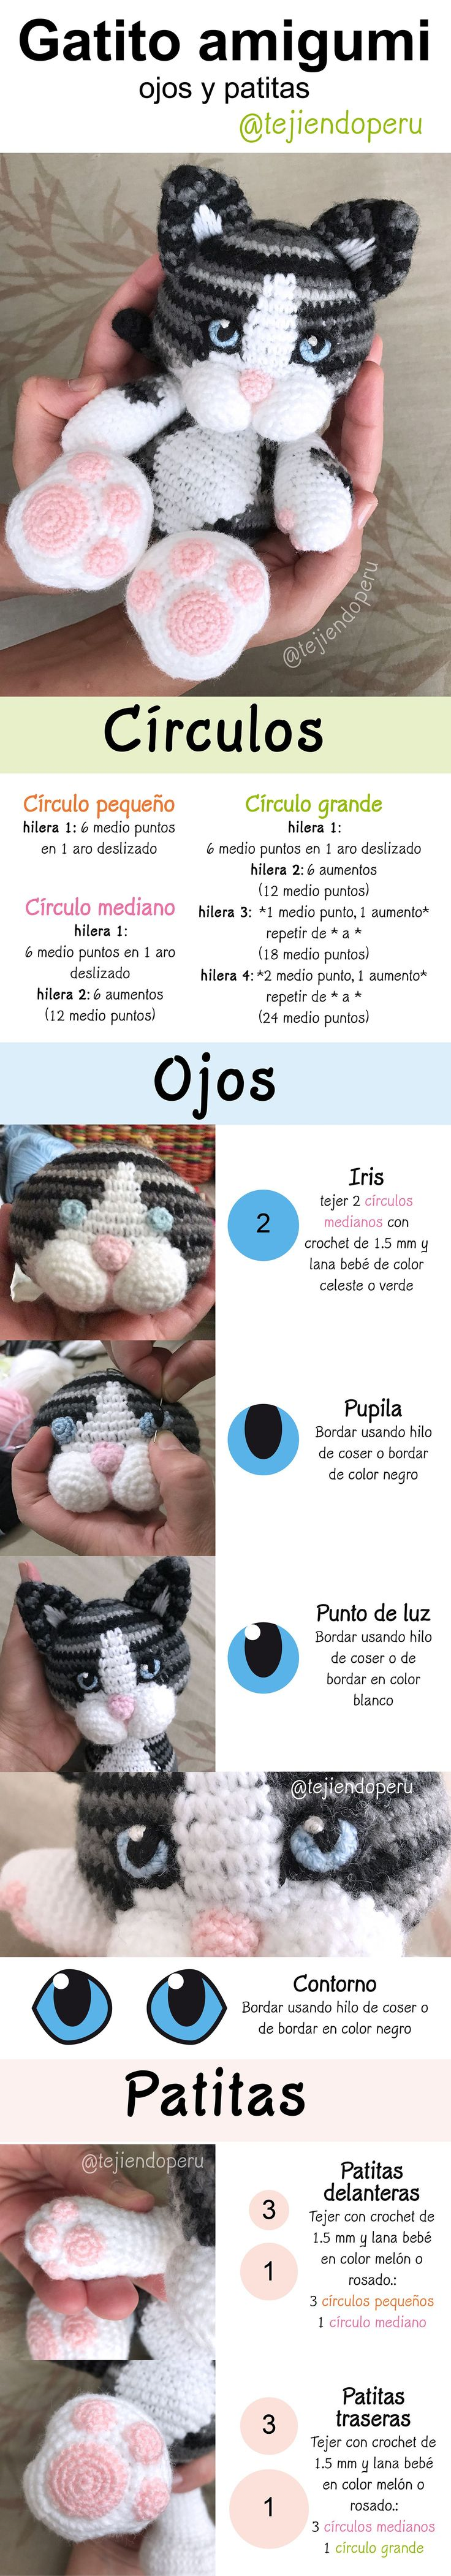 16 best tejidos images on Pinterest   Crochet patterns, Crochet ...